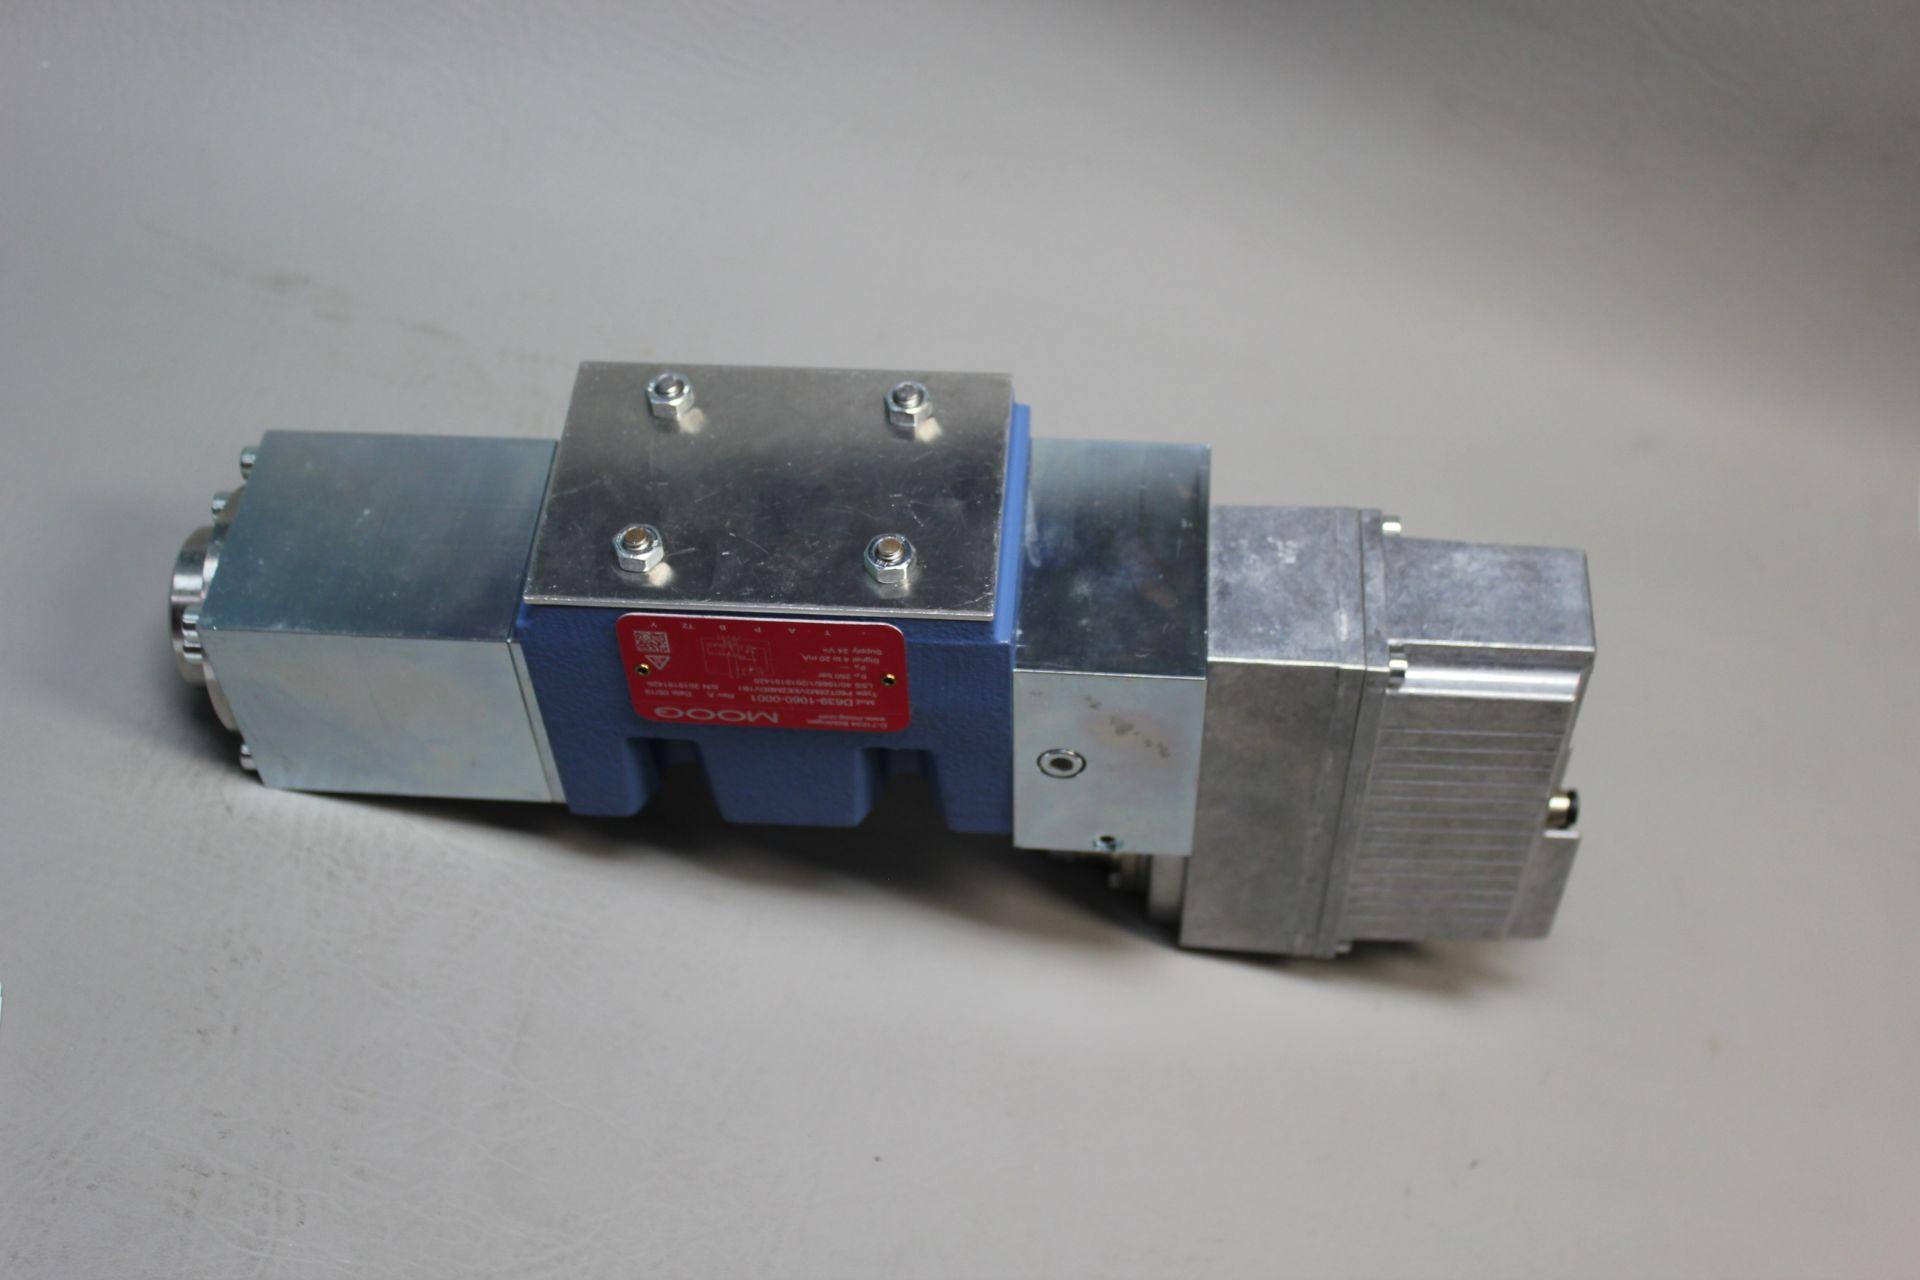 NEW MOOG DIRECT DRIVE DIGITAL CONTROL HYDRAULIC SERVO VALVE - Image 13 of 14